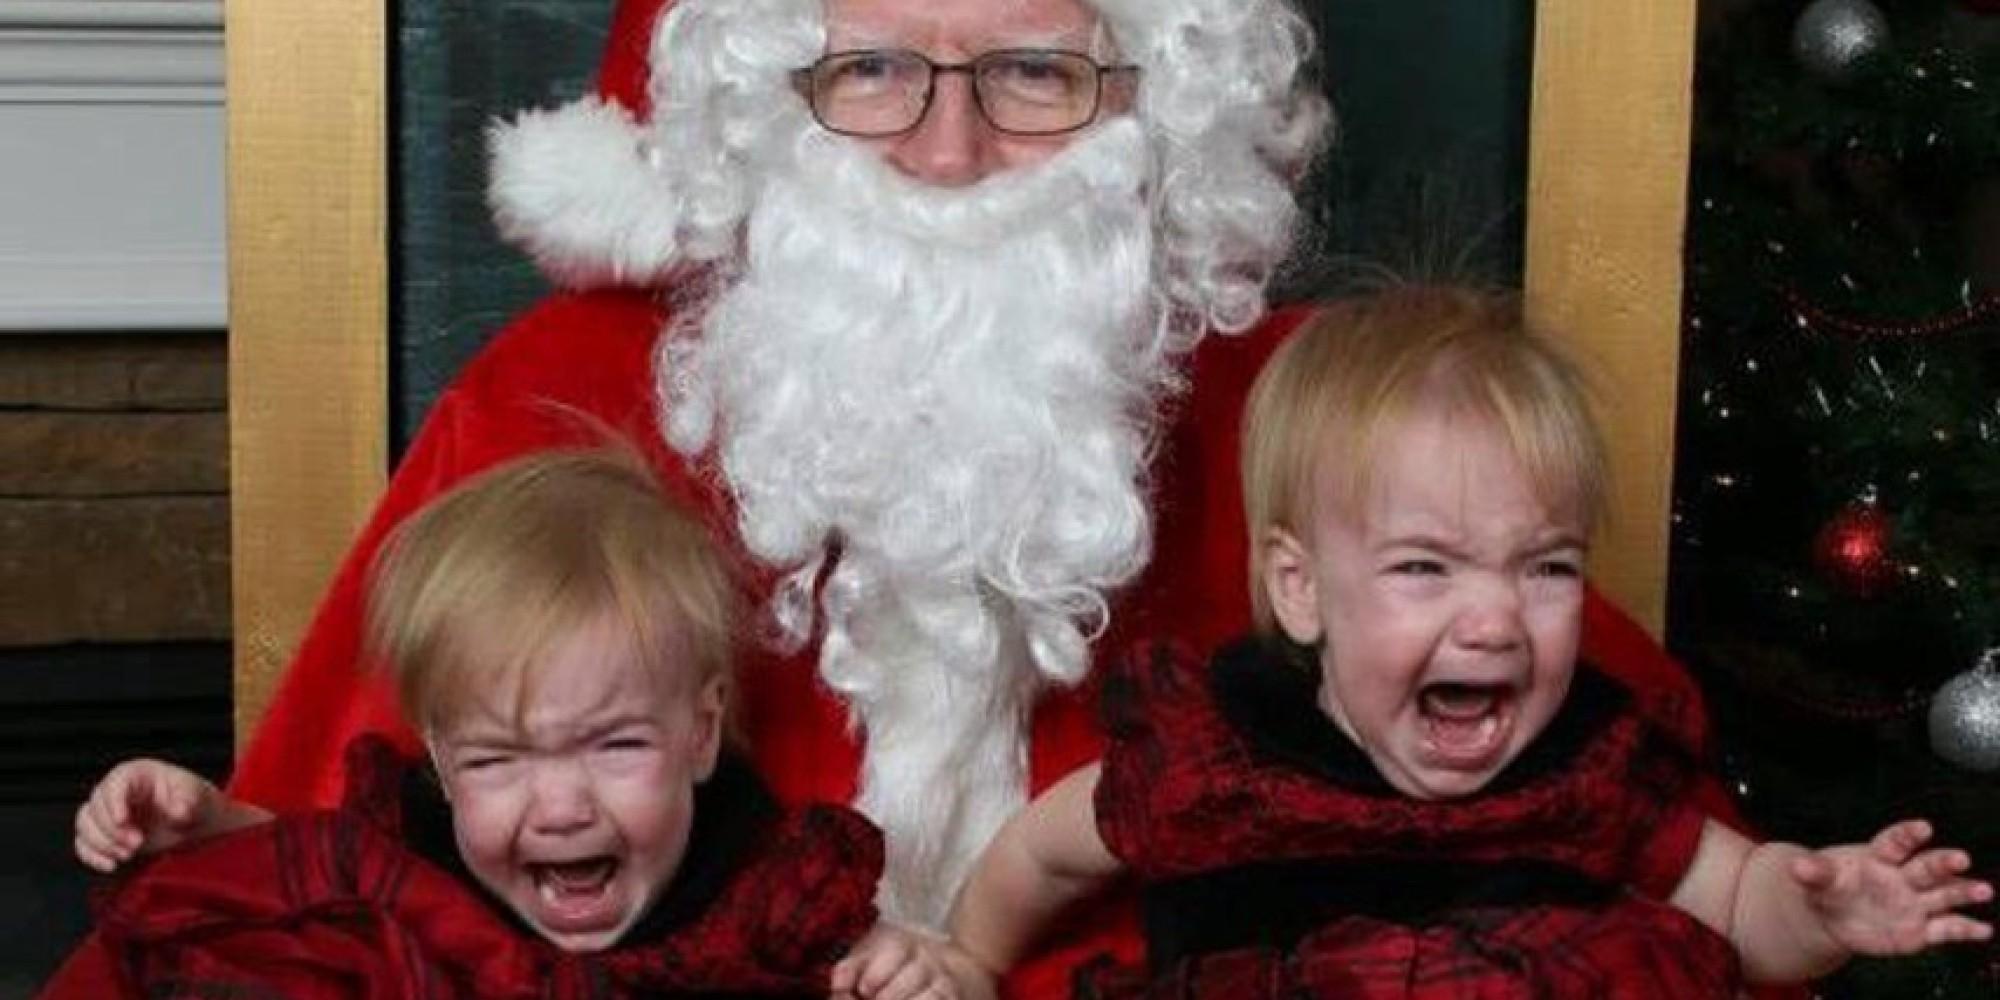 Santa and screaming kids.